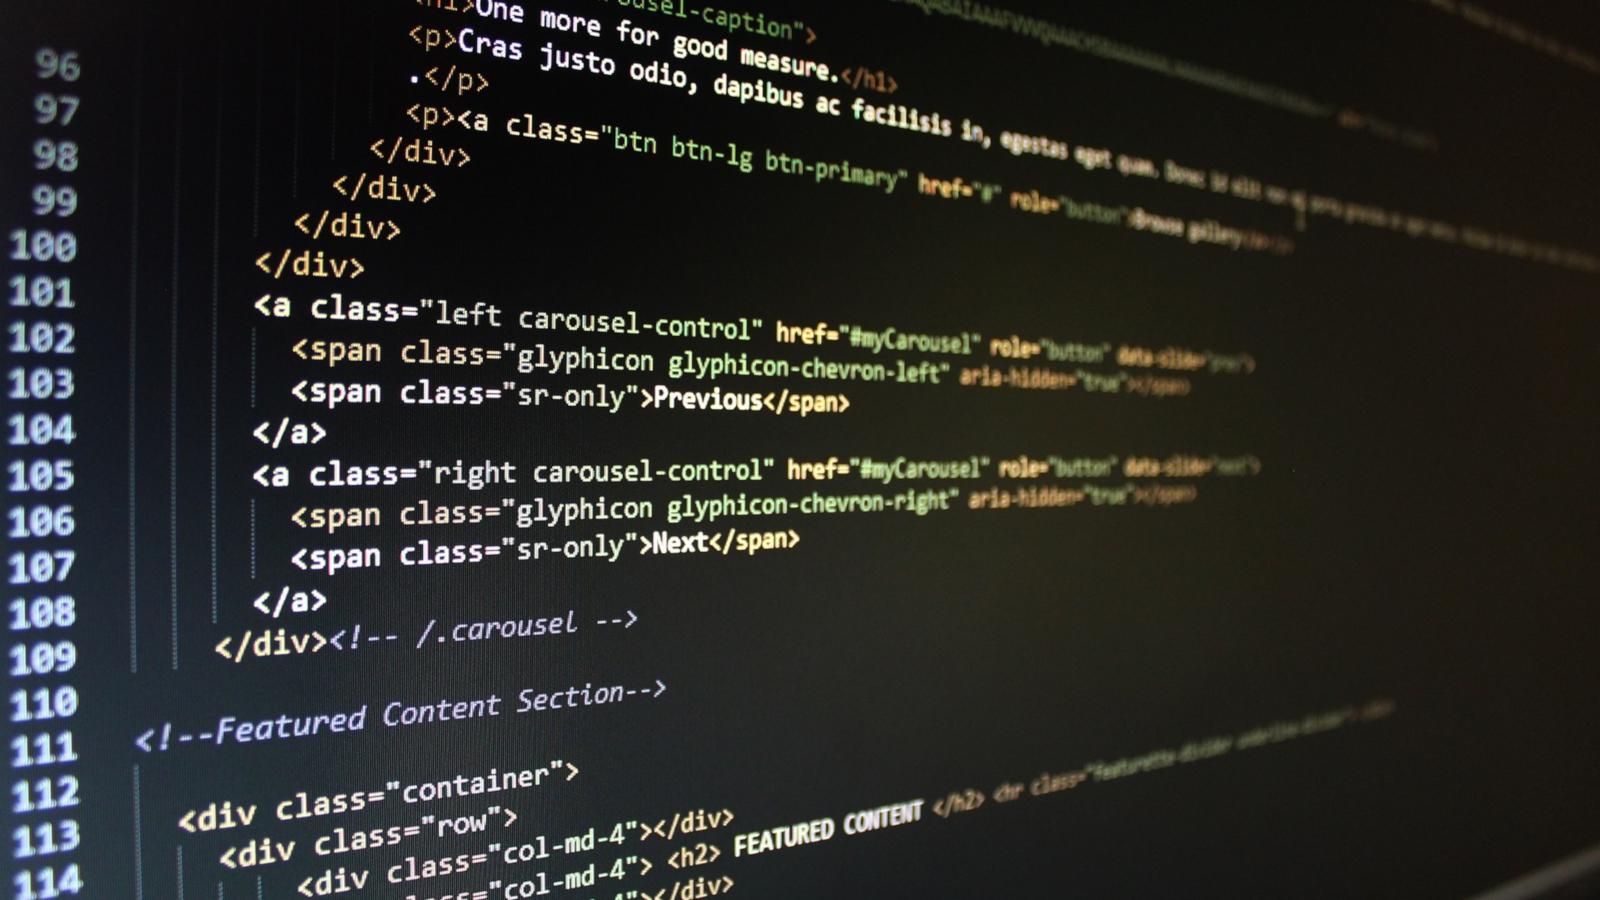 New Slack and GitHub Backdoor Malware Evades AntiVirus Detection